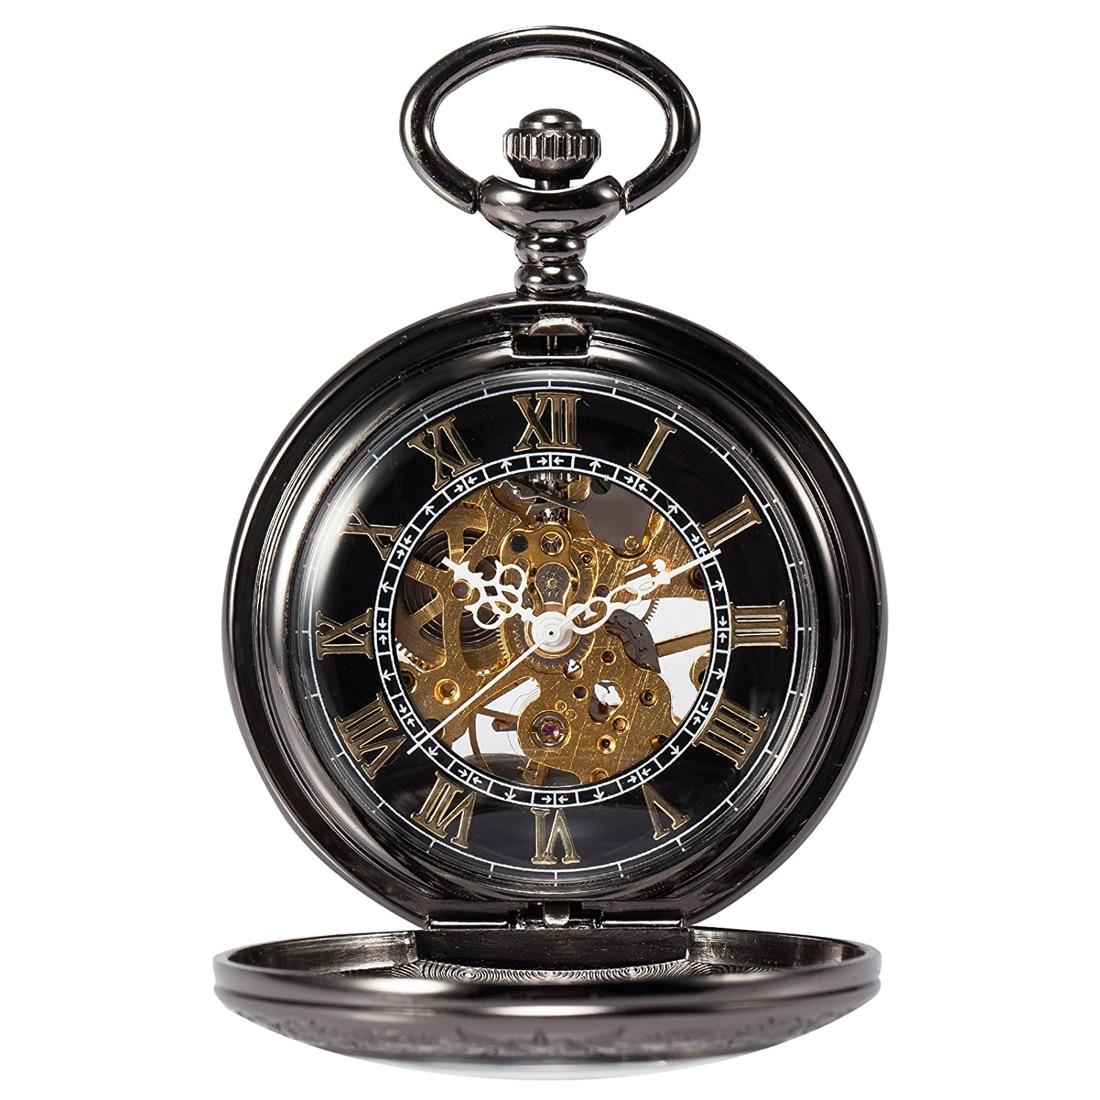 Practical man black Steampunk skeleton copper Pocket watchPractical man black Steampunk skeleton copper Pocket watch